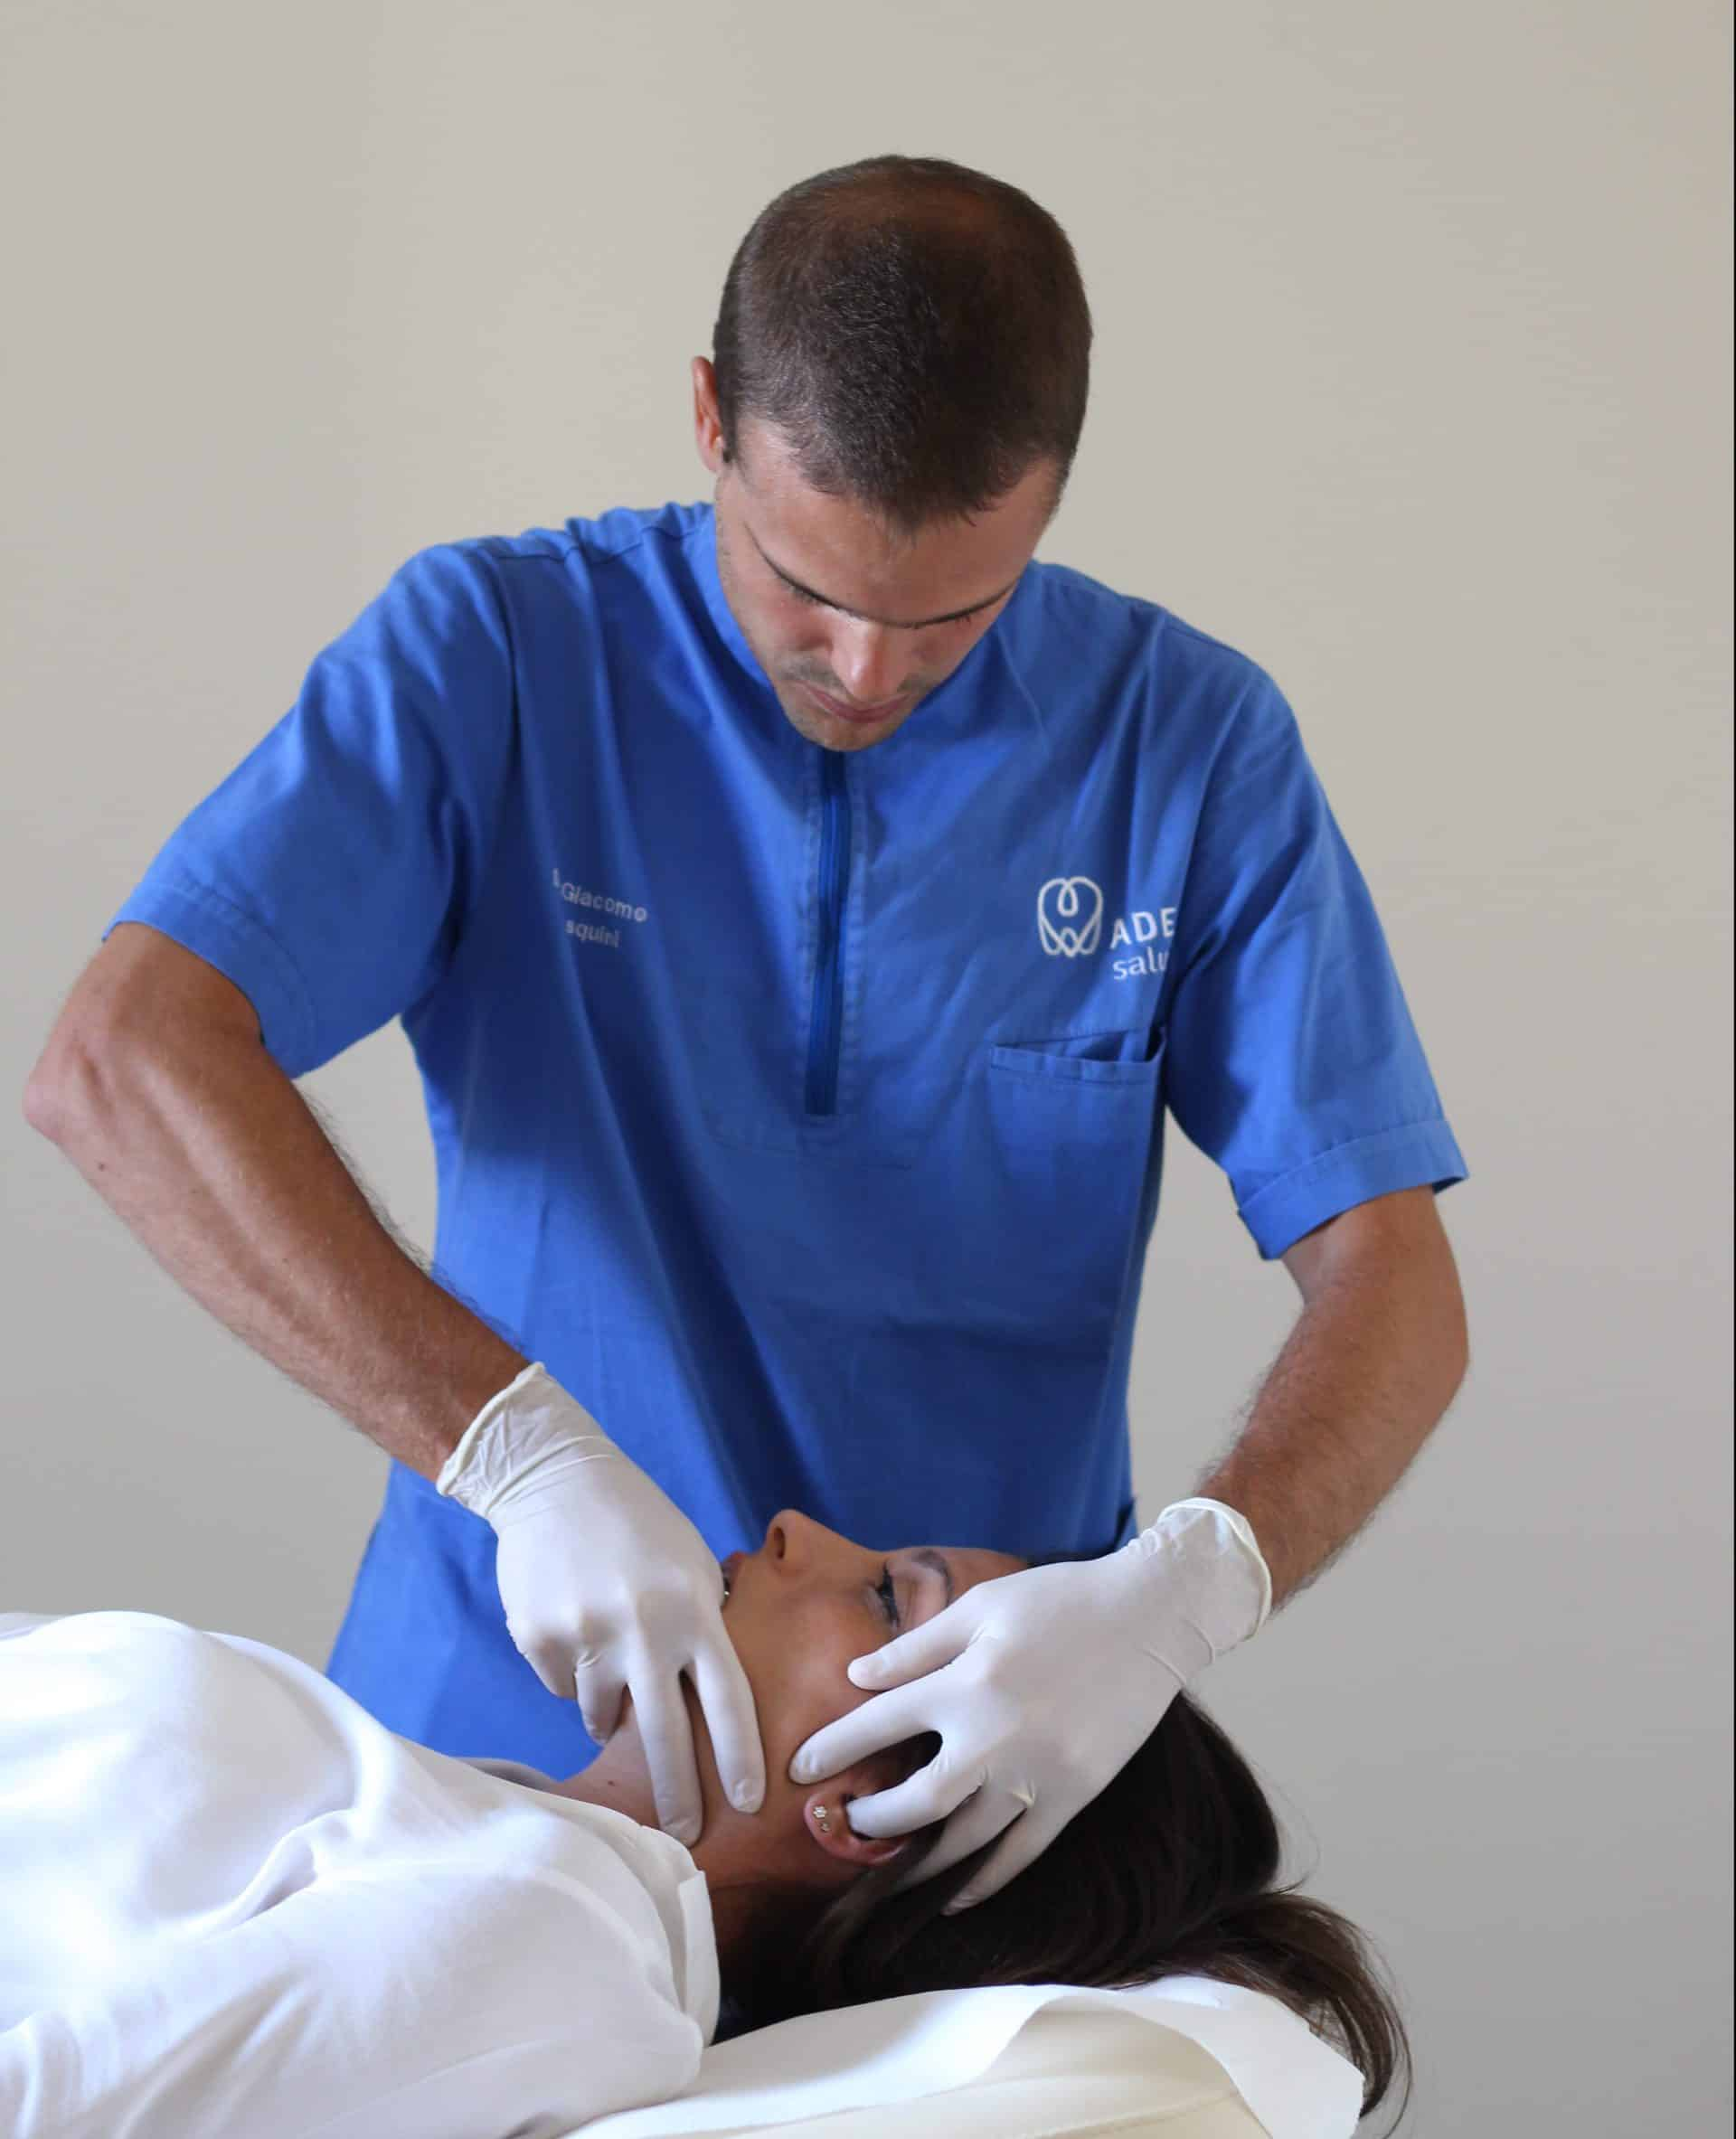 fisioterapia nell'odontoiatria